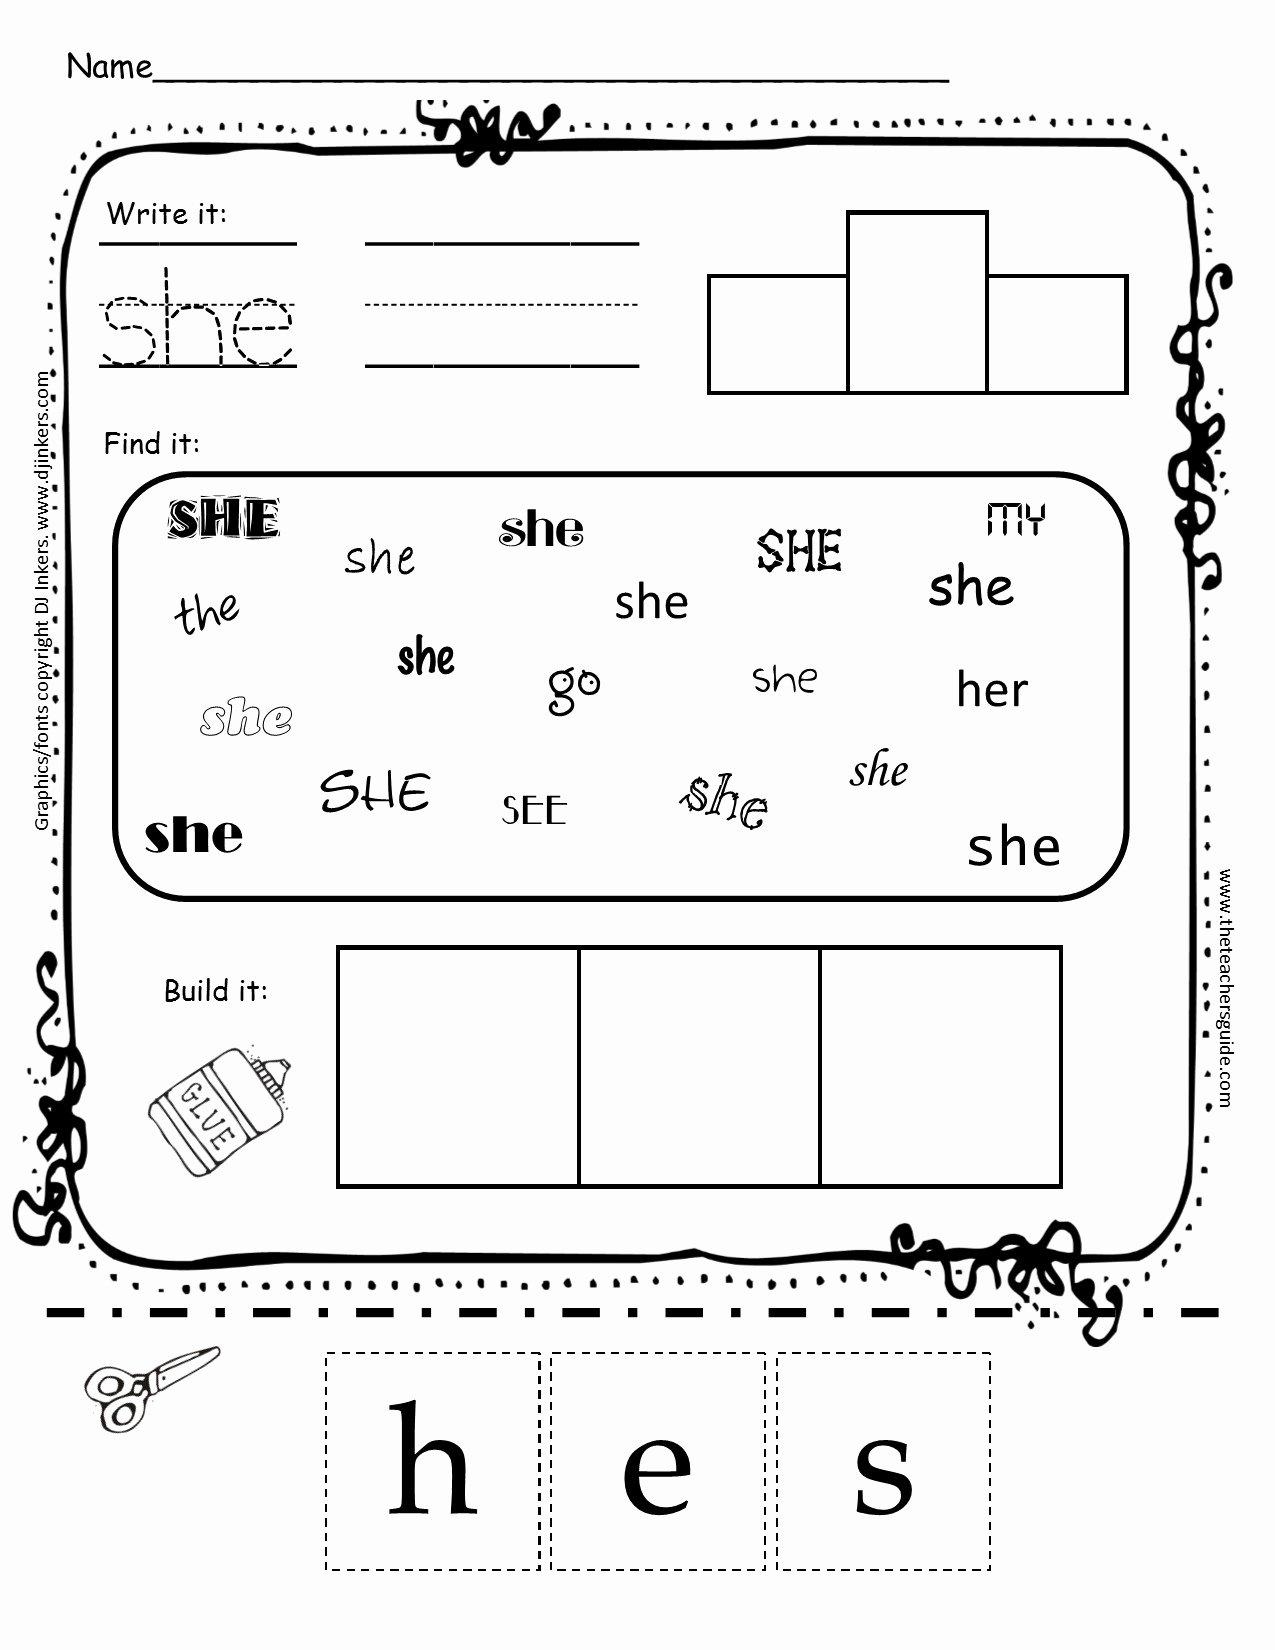 Sight Words Worksheet for Kindergarten Beautiful Worksheets for Kindergarten Sight Words Worksheet Mogenk